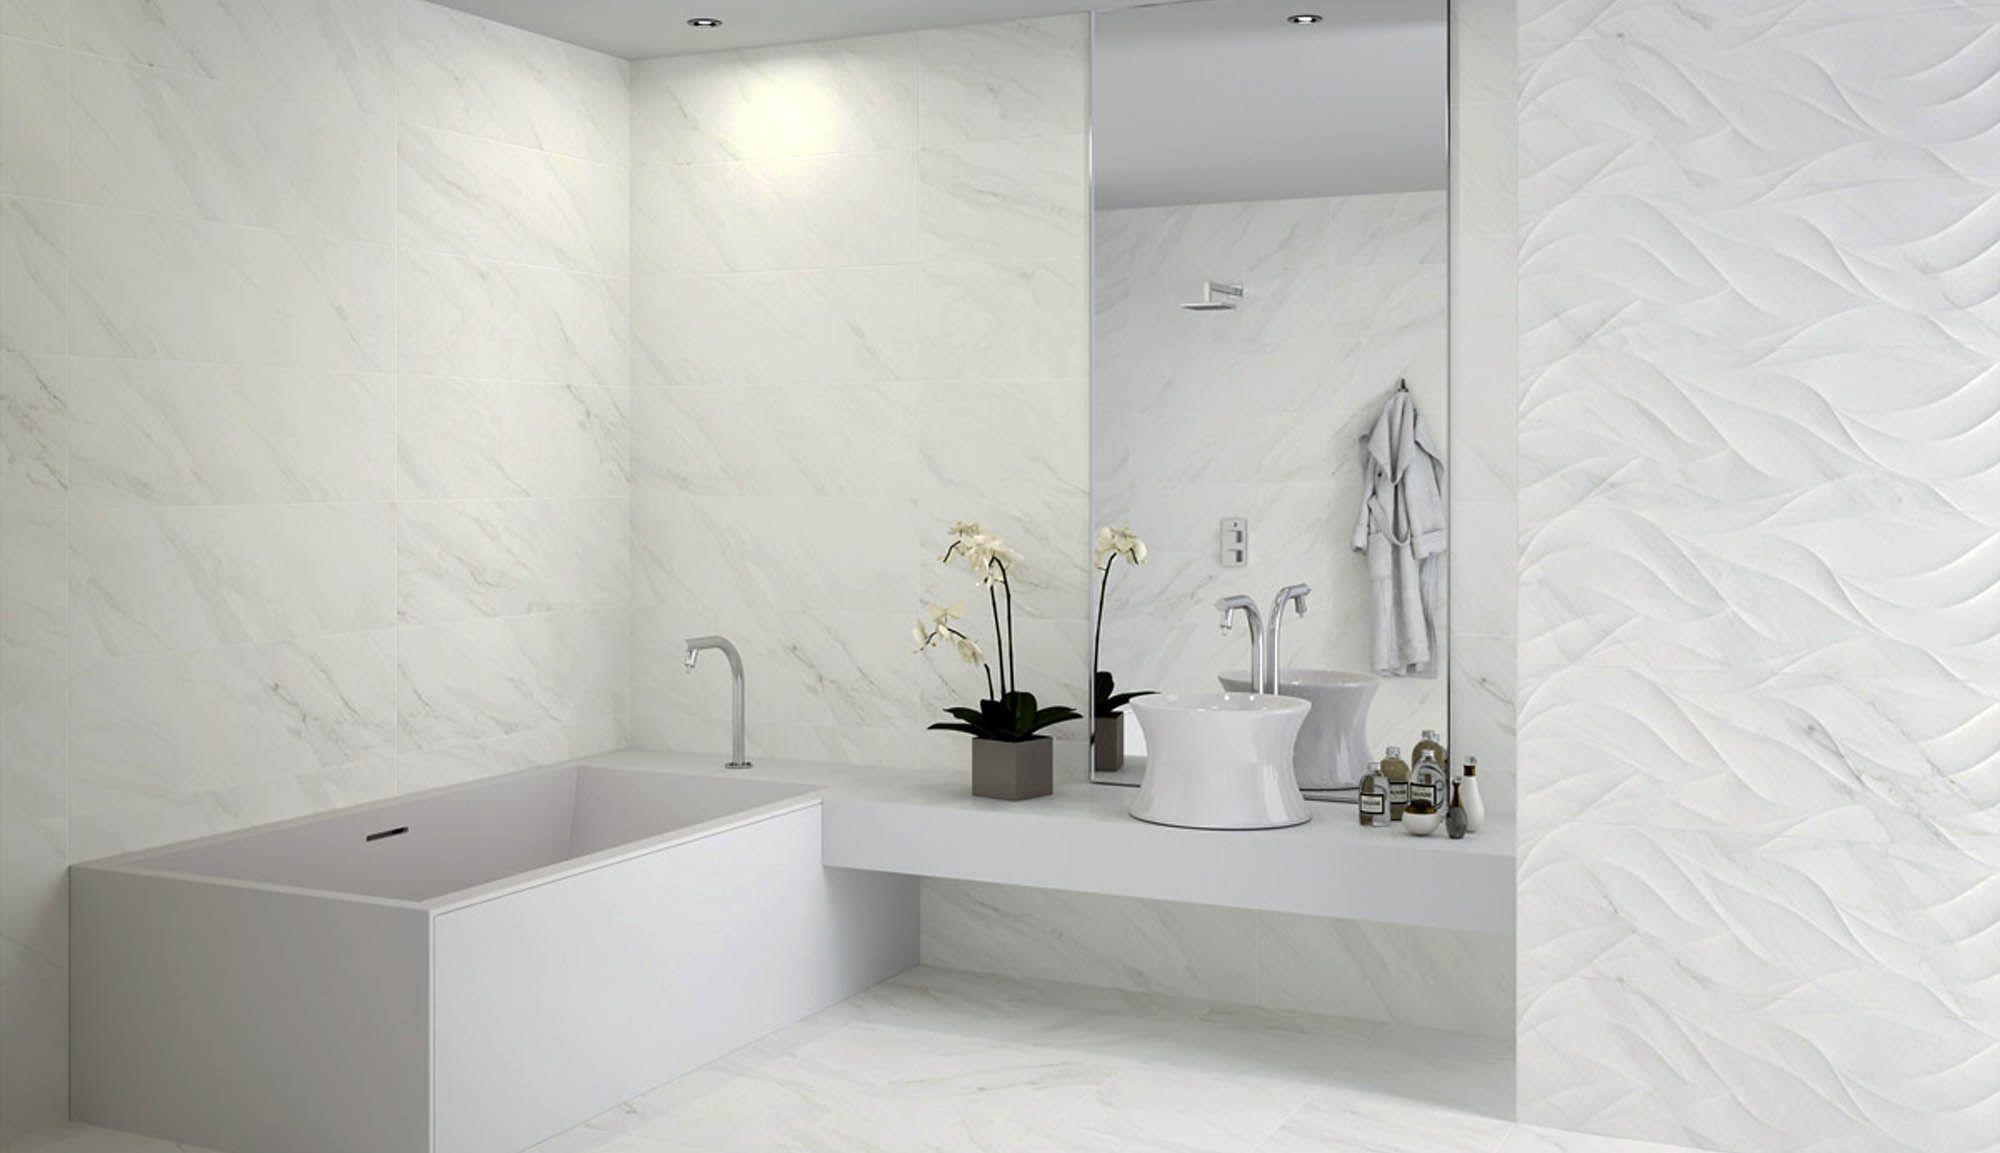 Bathroom Wall Tile Bernini Floors Tiles Orlando